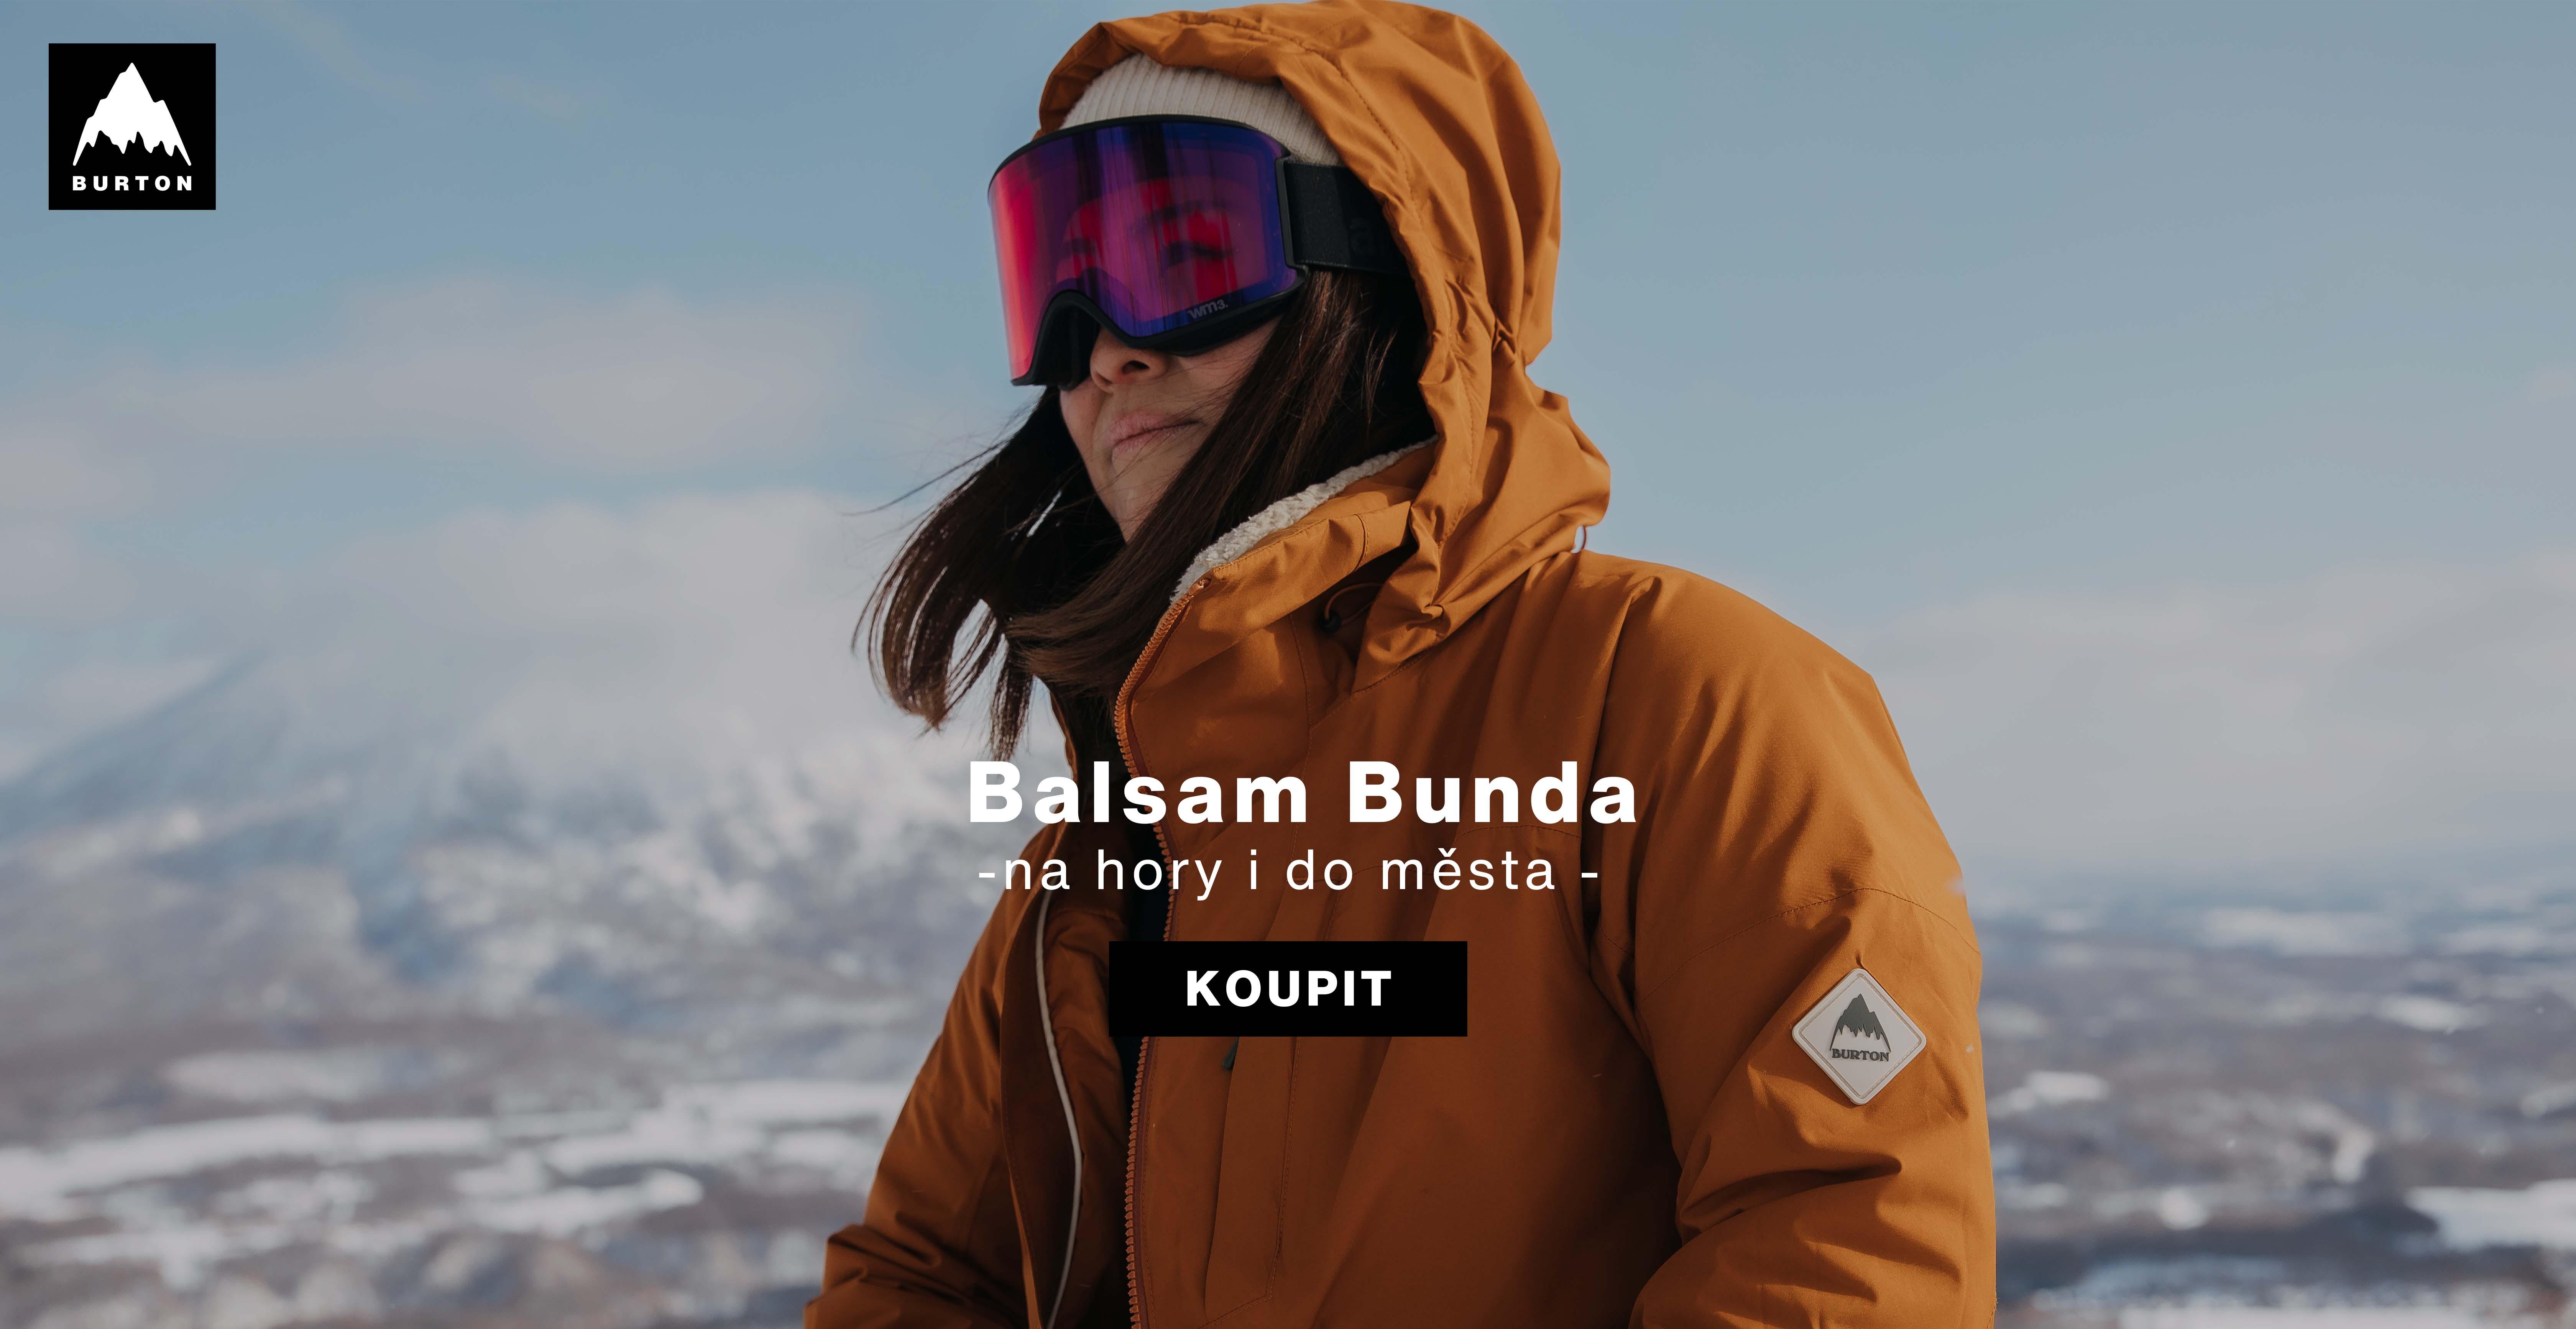 Balsam Bunda